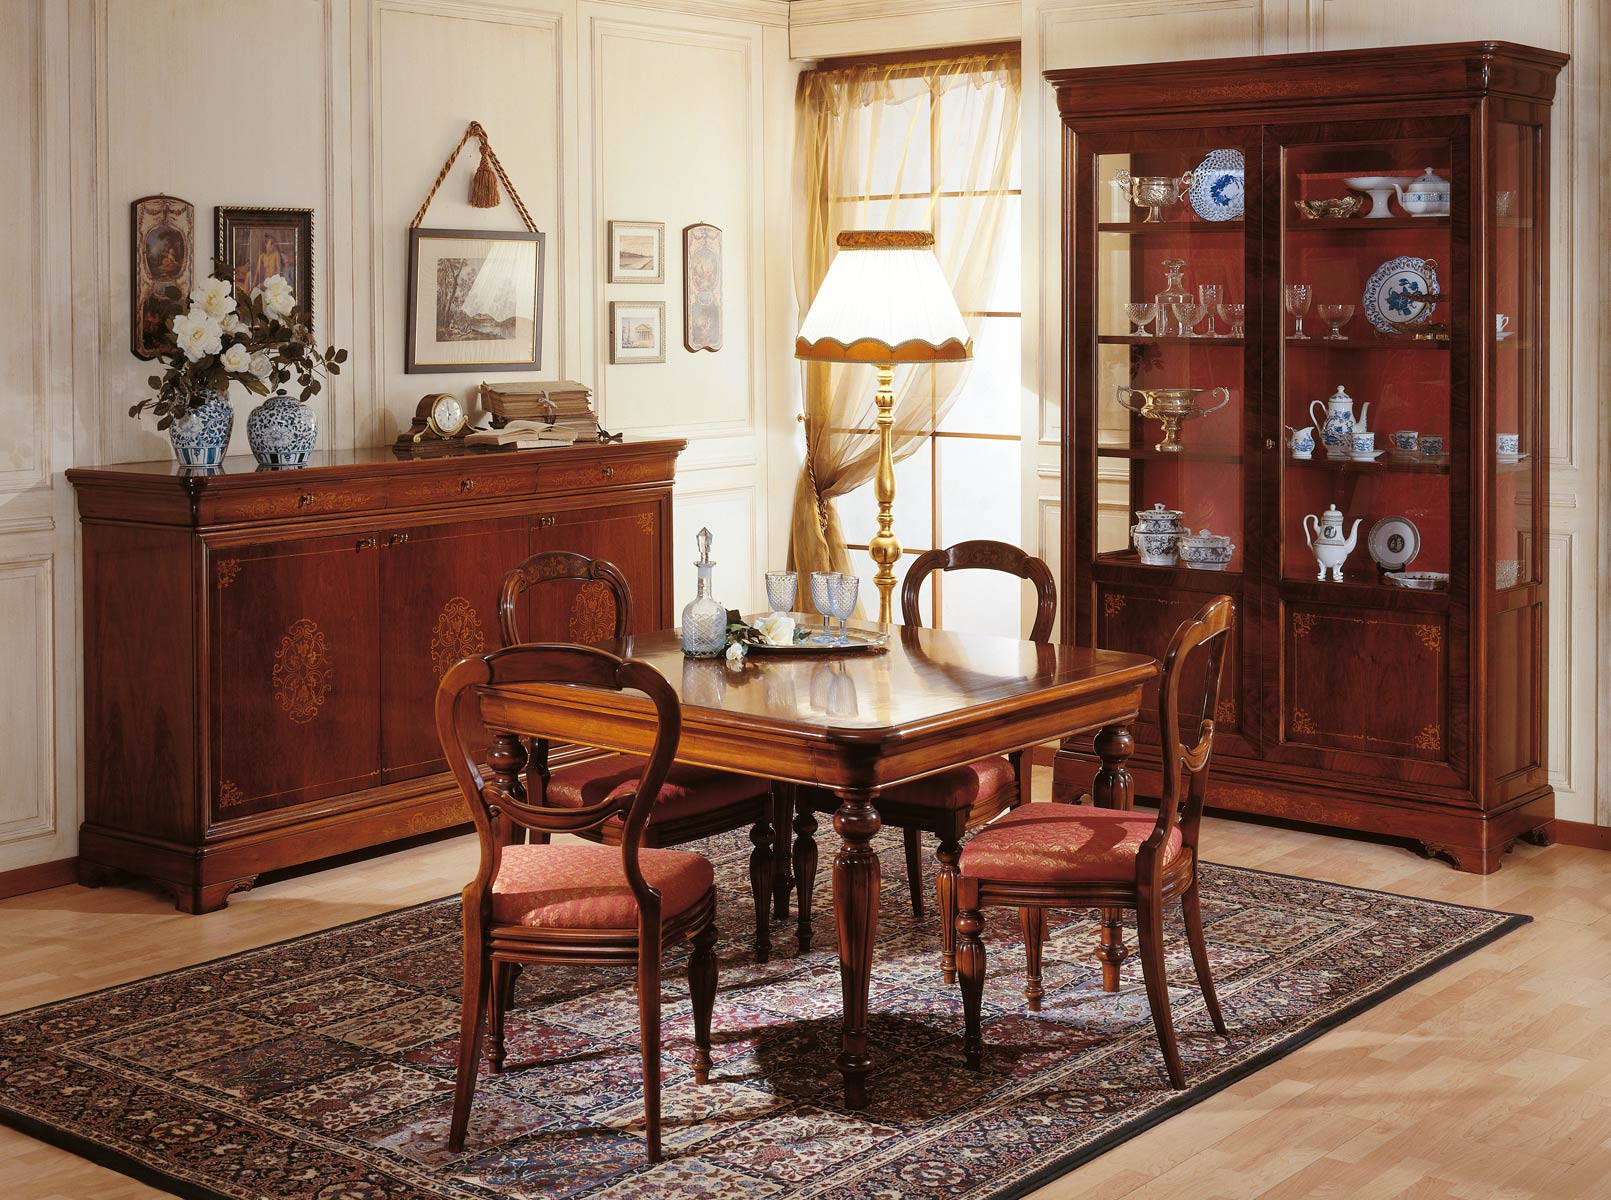 Dining room 19th century french vimercati classic furniture for Sala da pranzo decor